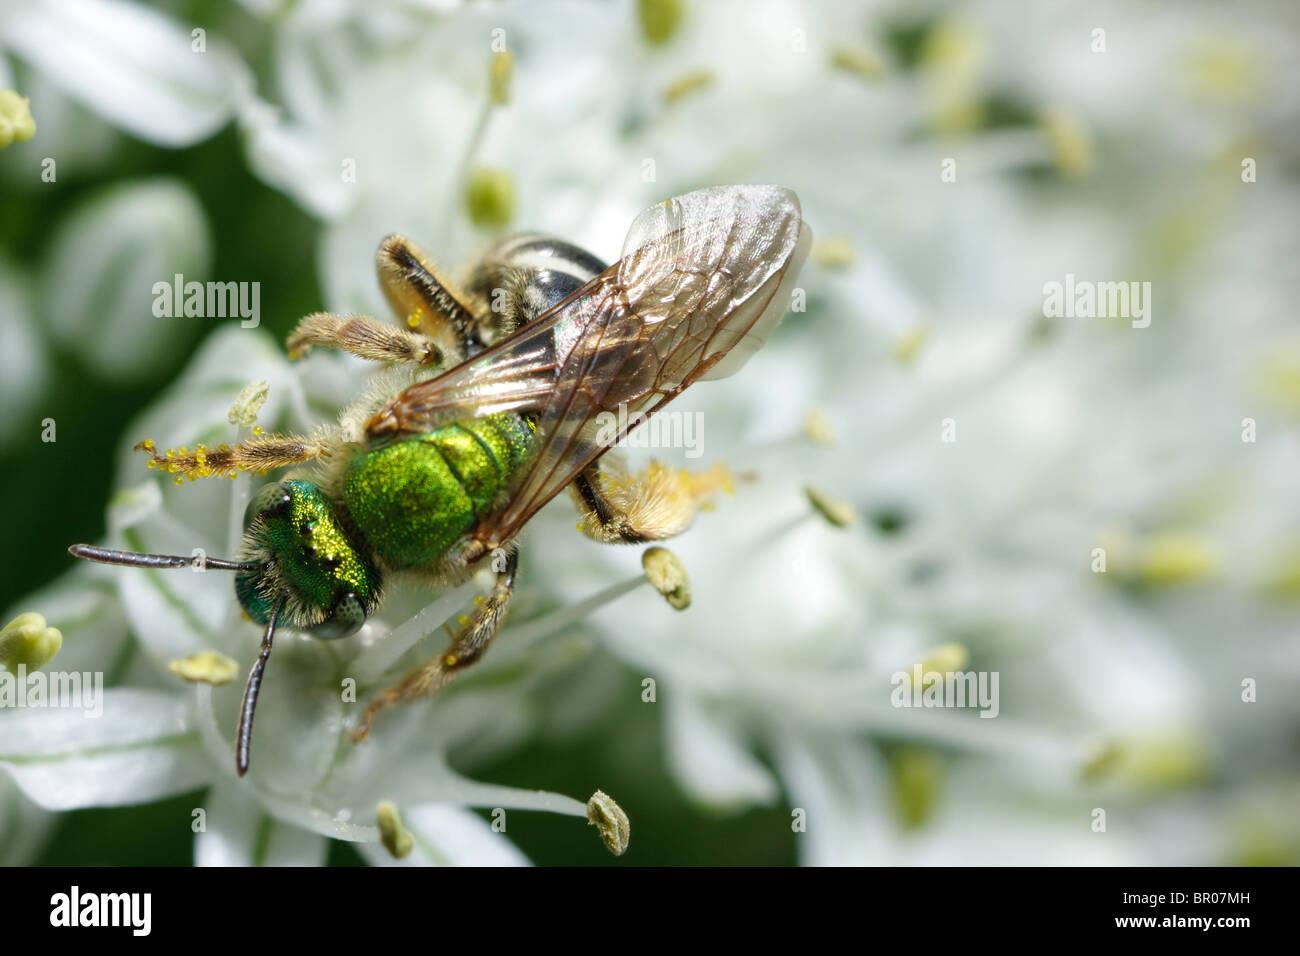 A green metallic bee (Agapostemon virescens) gathers nectar. - Stock Image